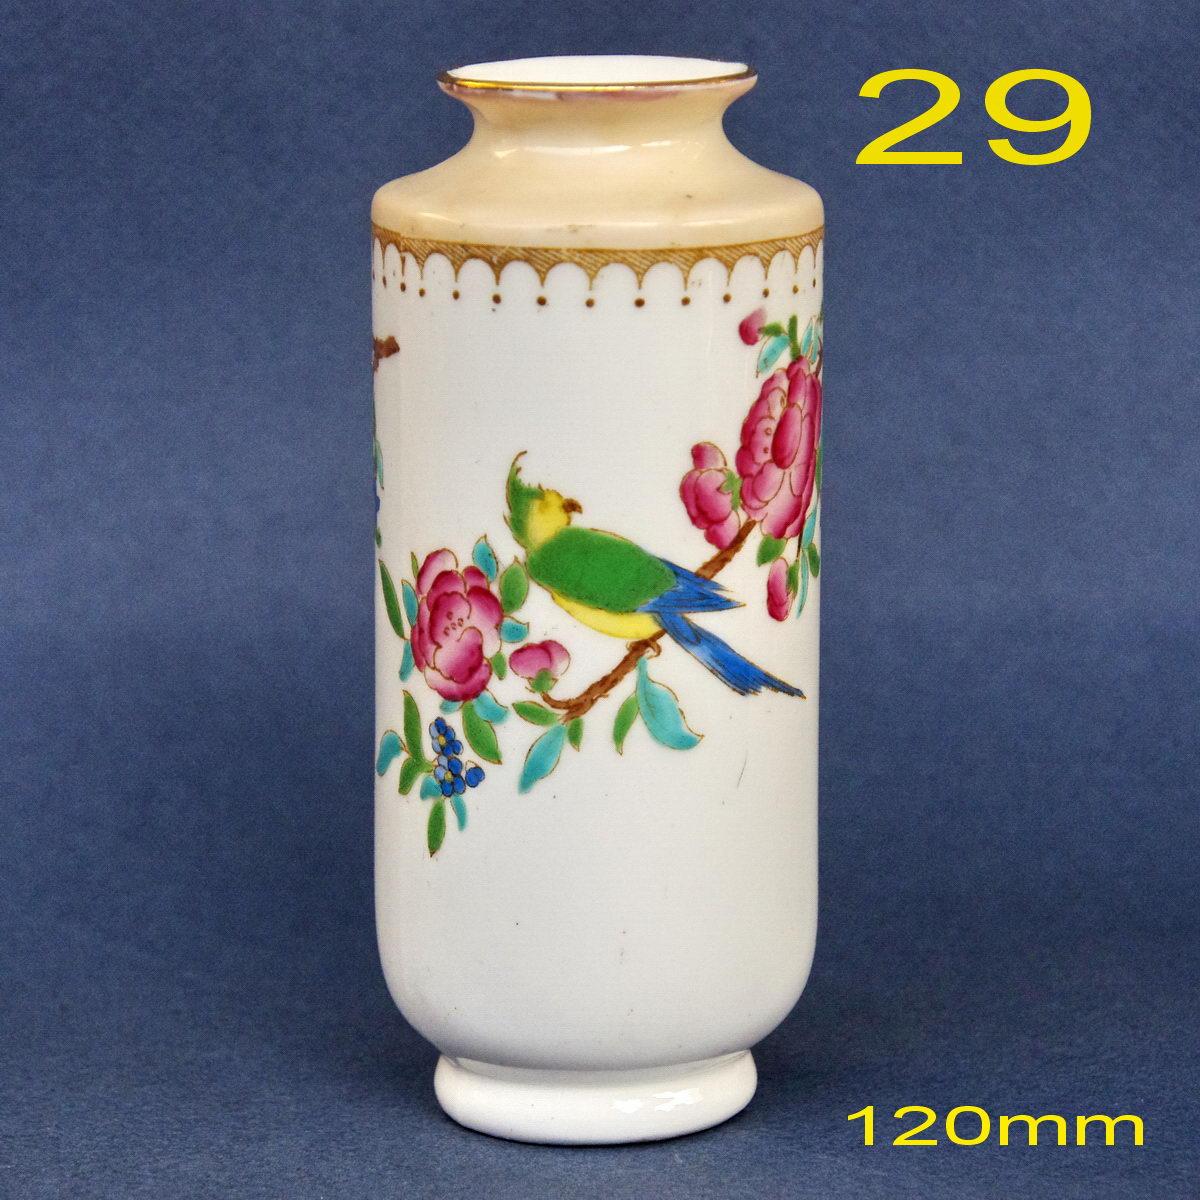 Shape 29 of Small China Vase Series